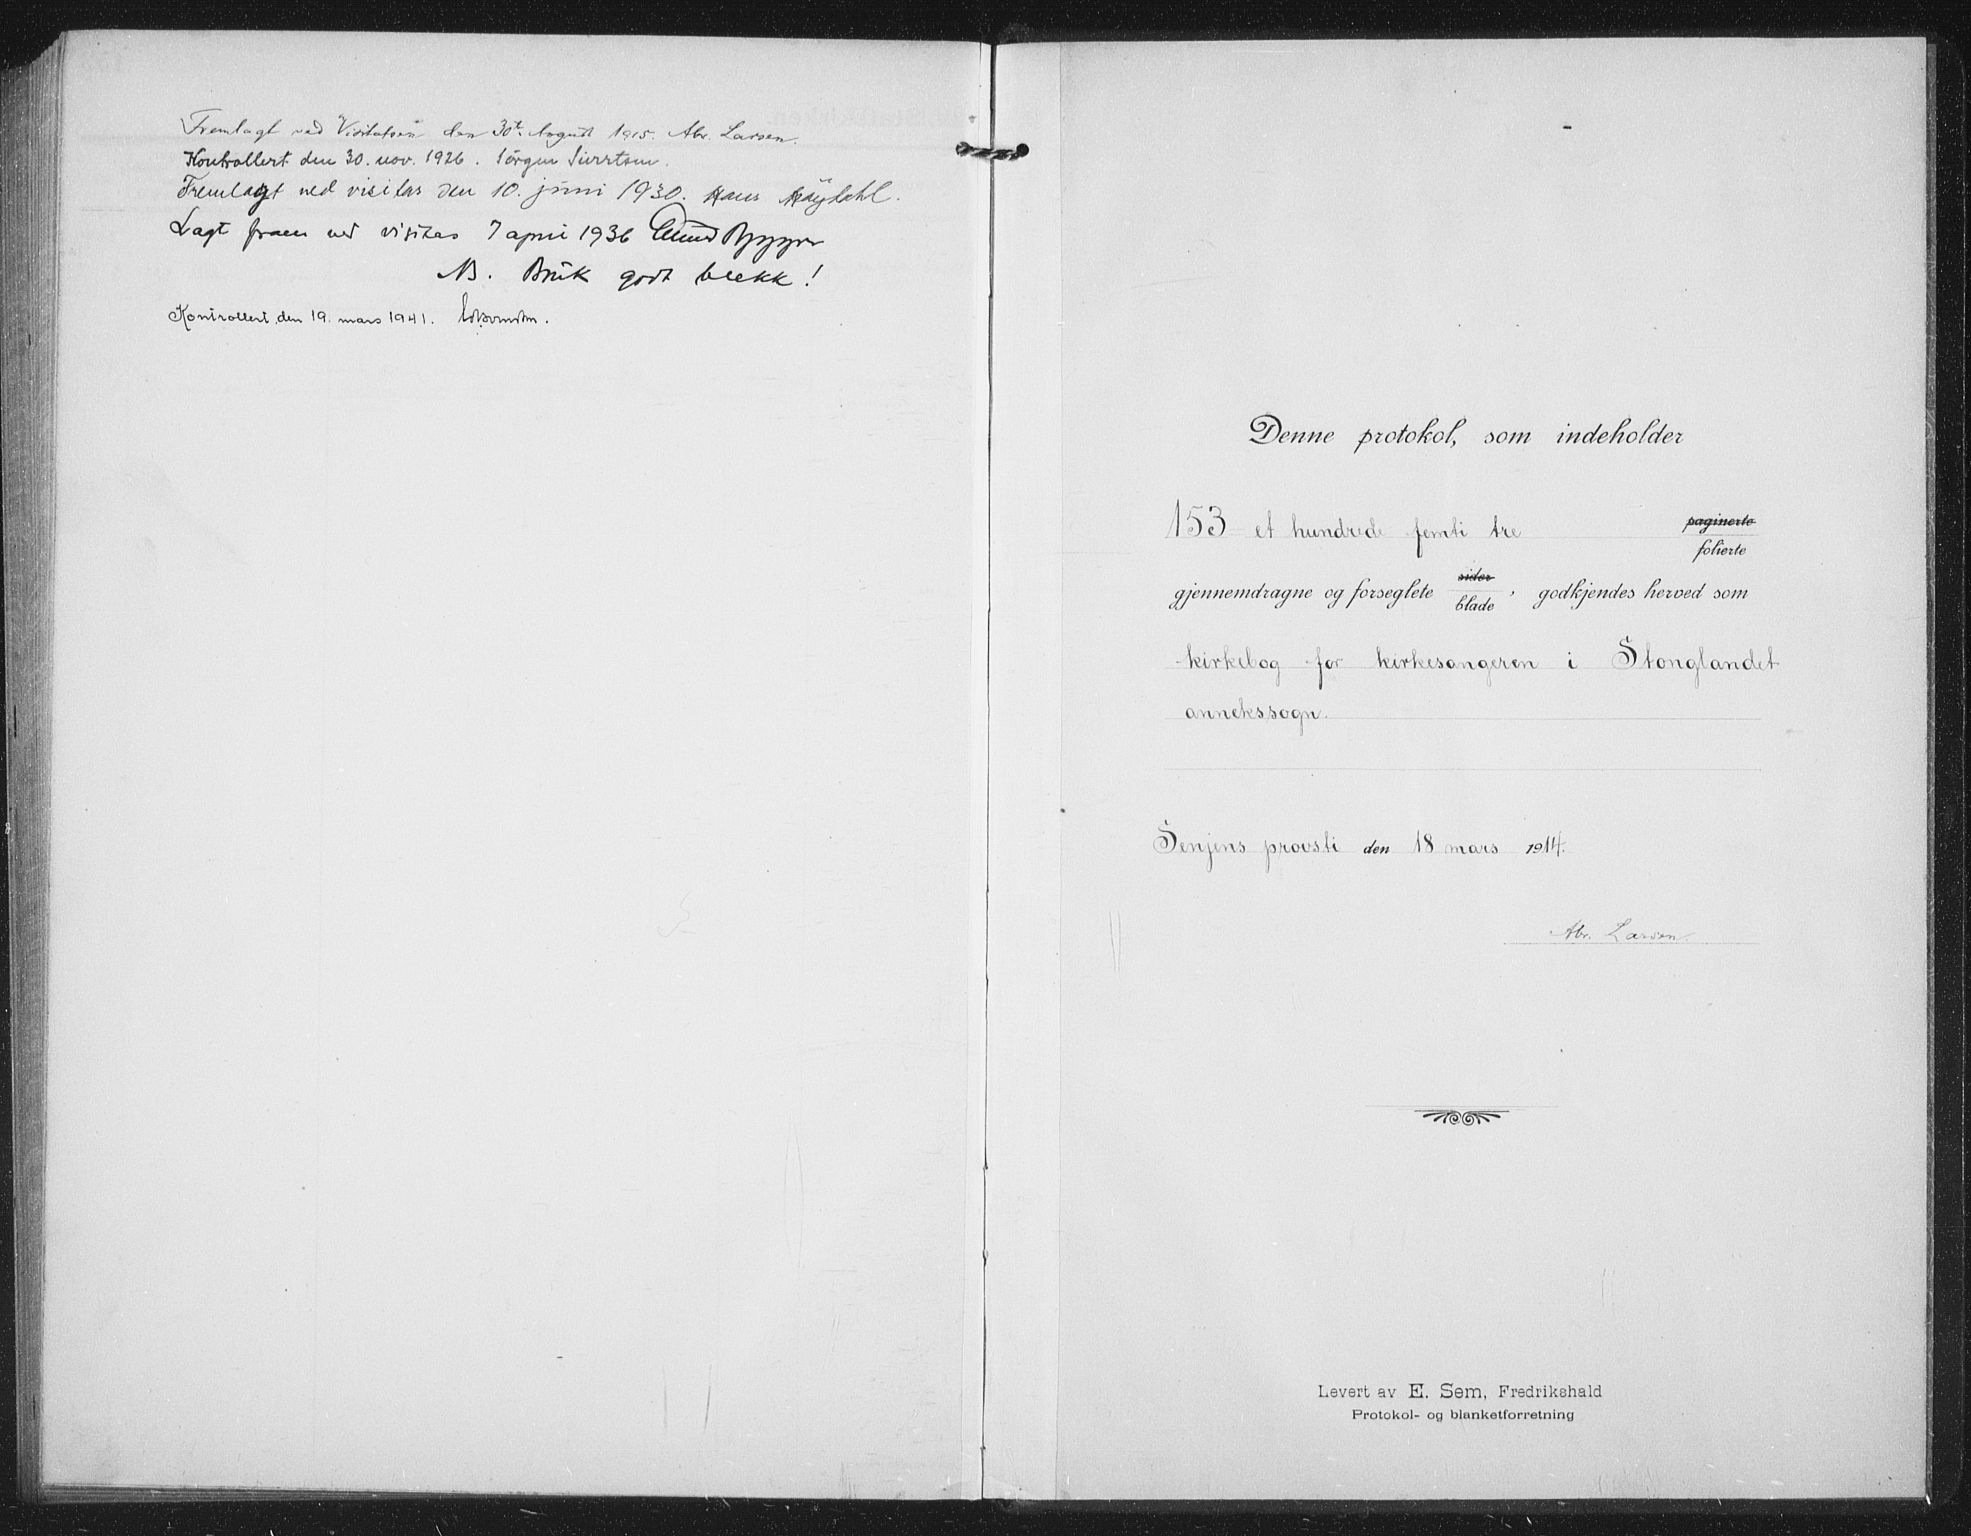 SATØ, Tranøy sokneprestkontor, I/Ia/Iab/L0019klokker: Klokkerbok nr. 19, 1914-1940